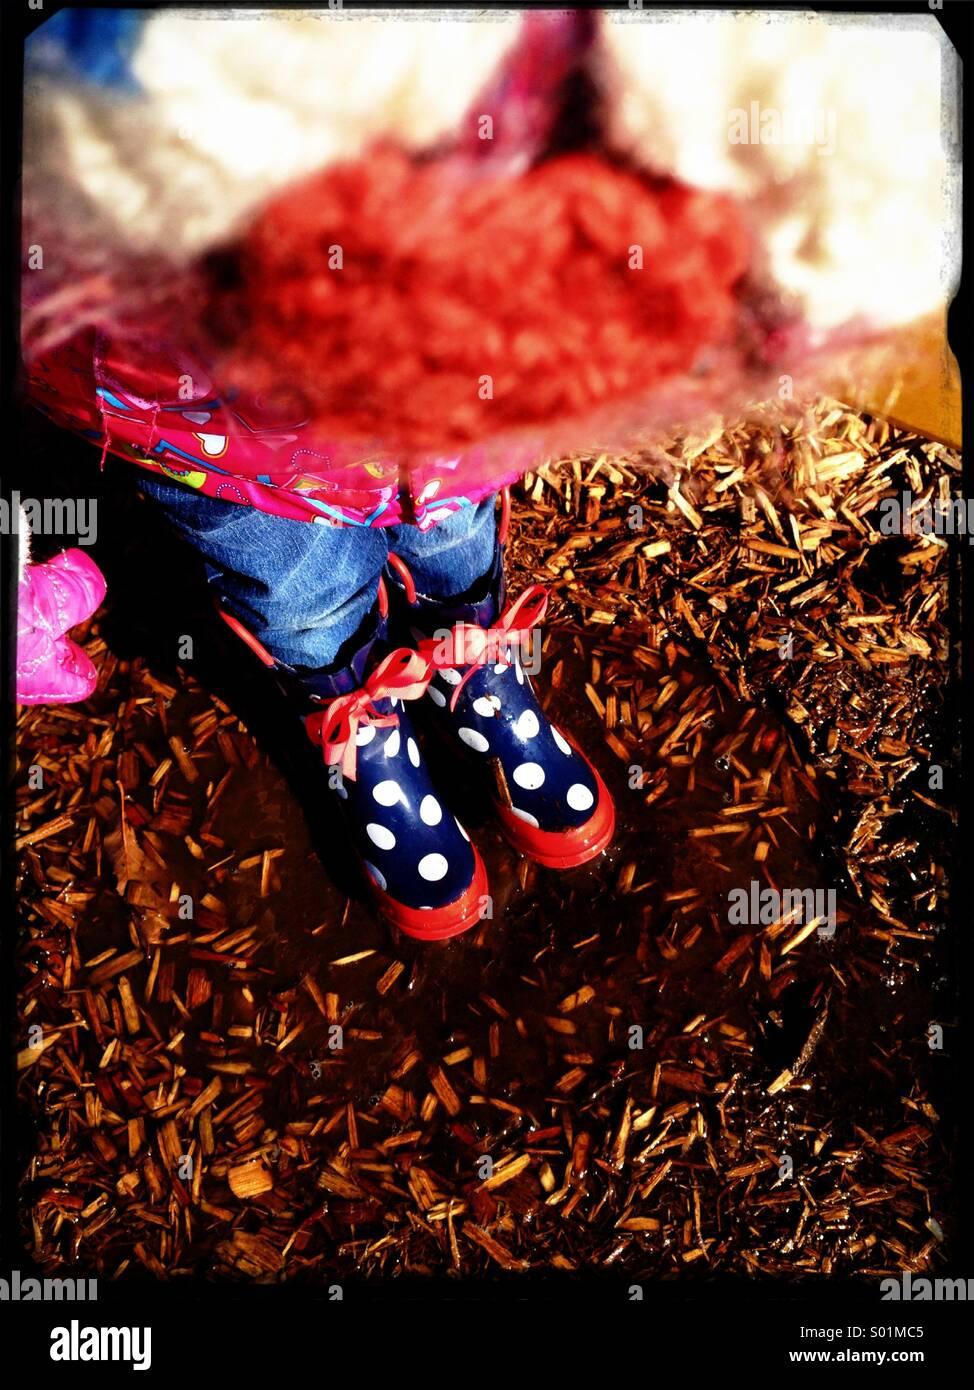 Little girl in polka dot rain boots. - Stock Image